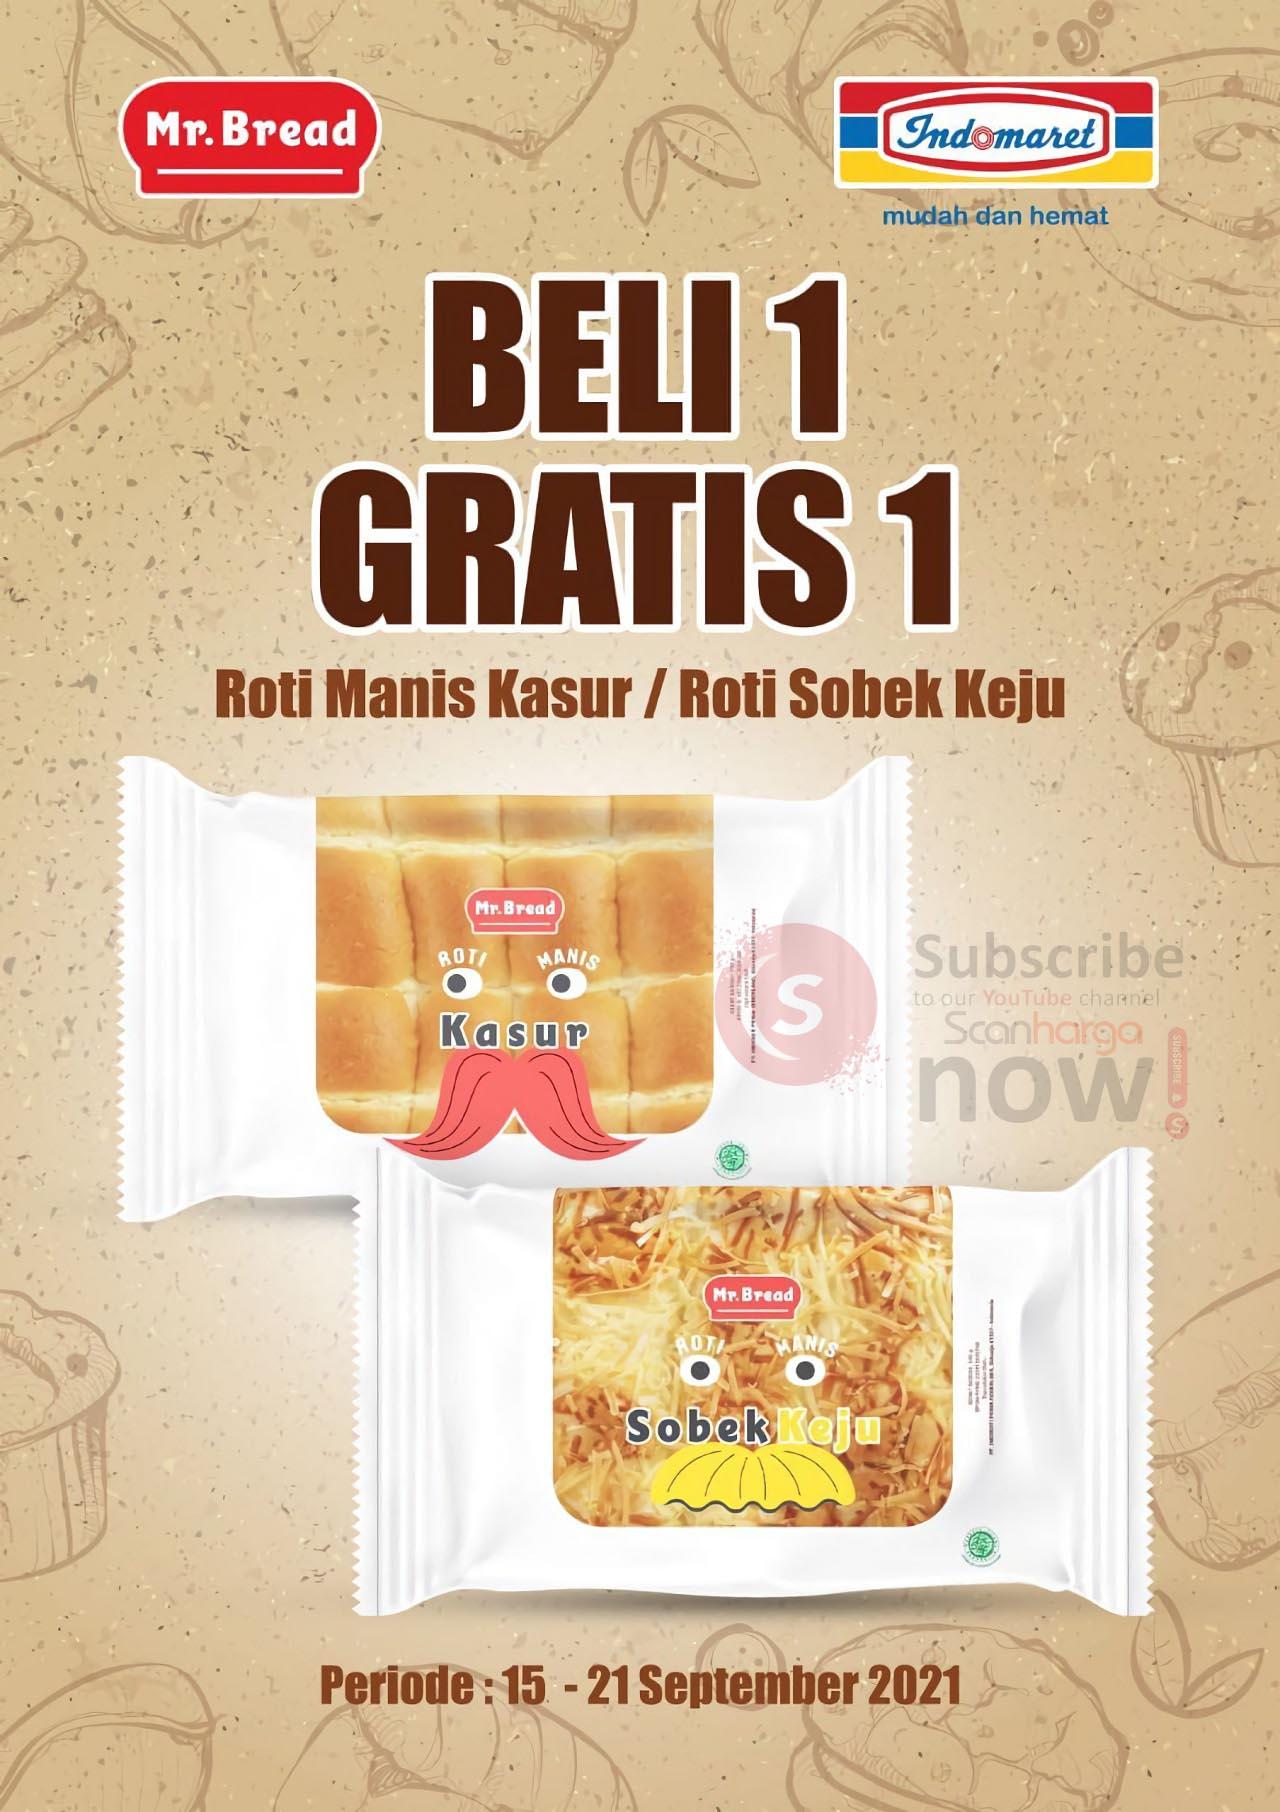 Promo Mr Bread Roti Indomaret Beli 1 Gratis 1 Periode 15 - 21 September 2021